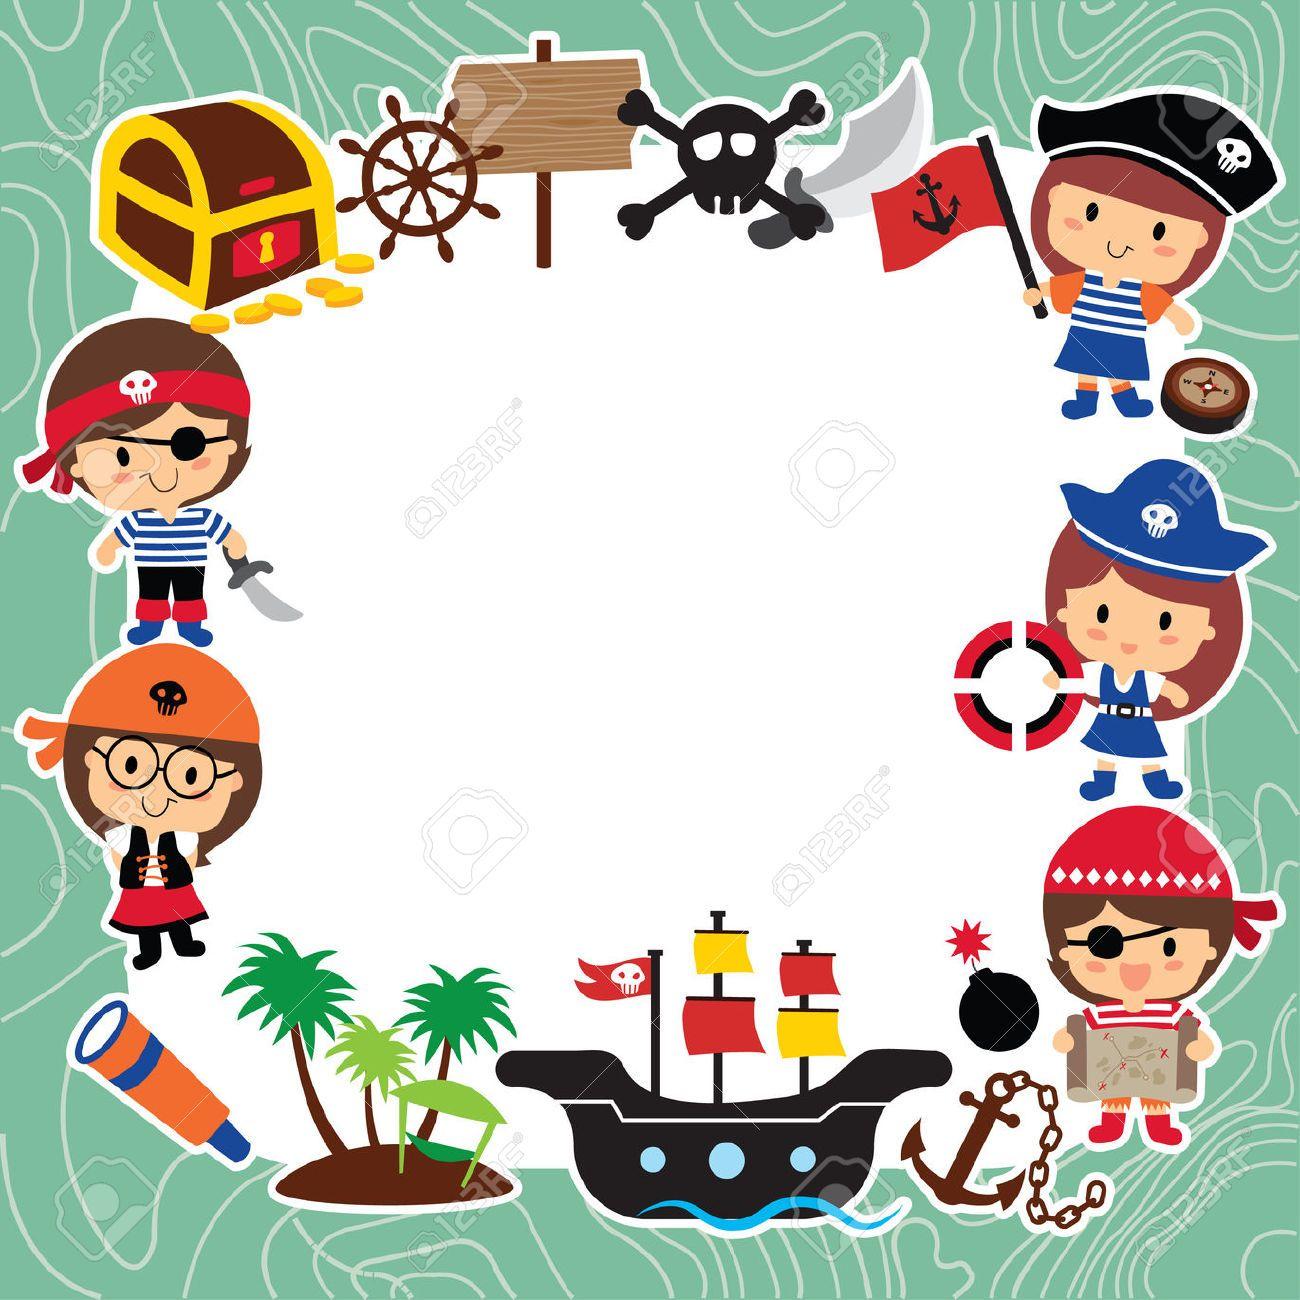 32649556 Pirates Kids Layout Design Stock Vector